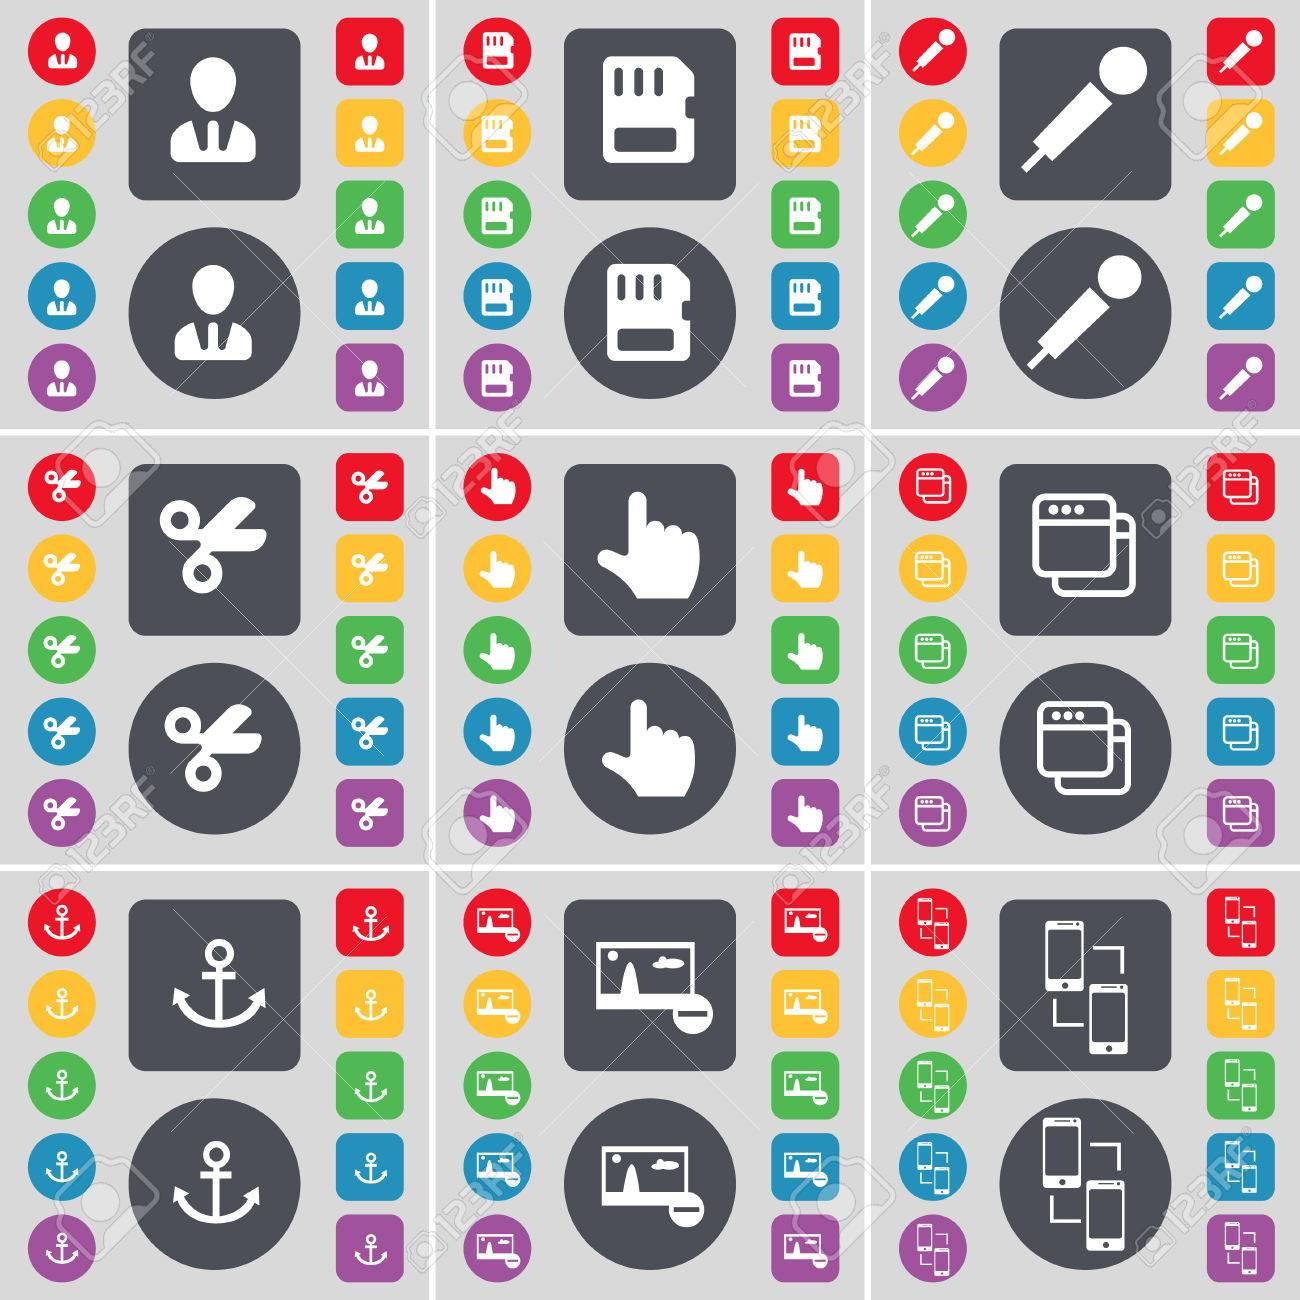 Avatar, SIM-Karte, Mikrofon, Schere, Hand, Fenster, Anker, Bild ...